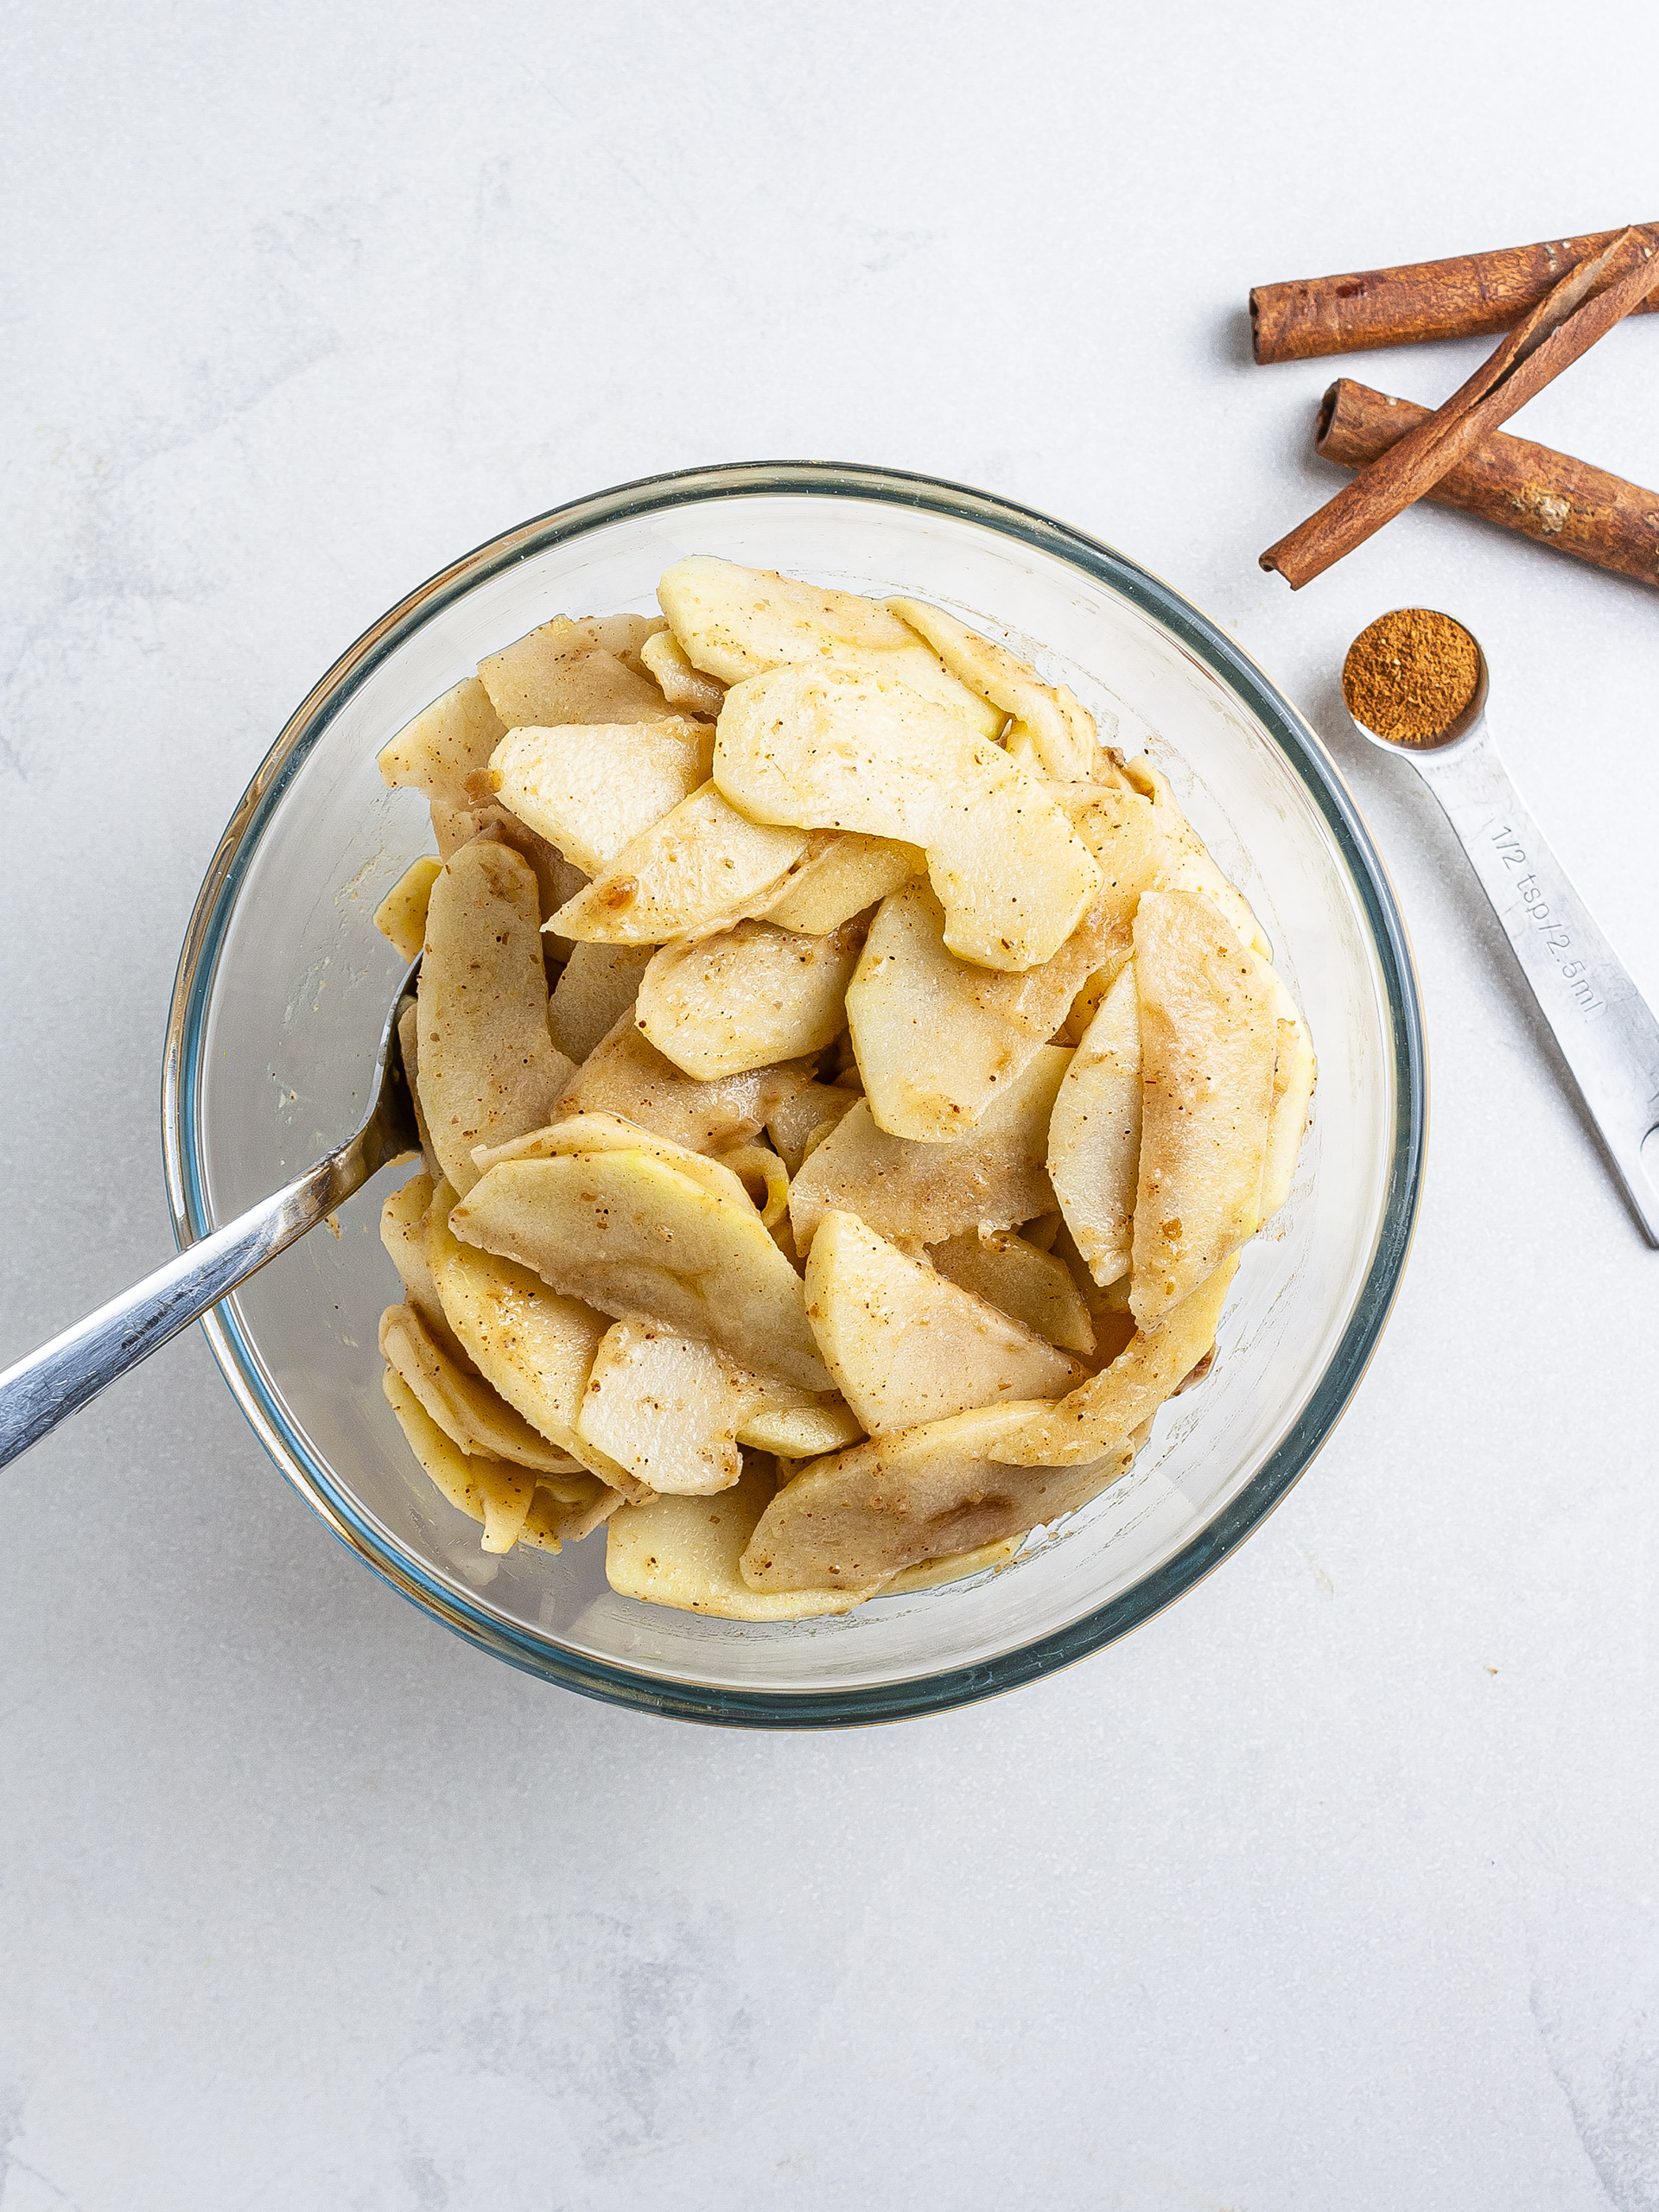 Step 2.2 of Vegan Apple Pie Recipe